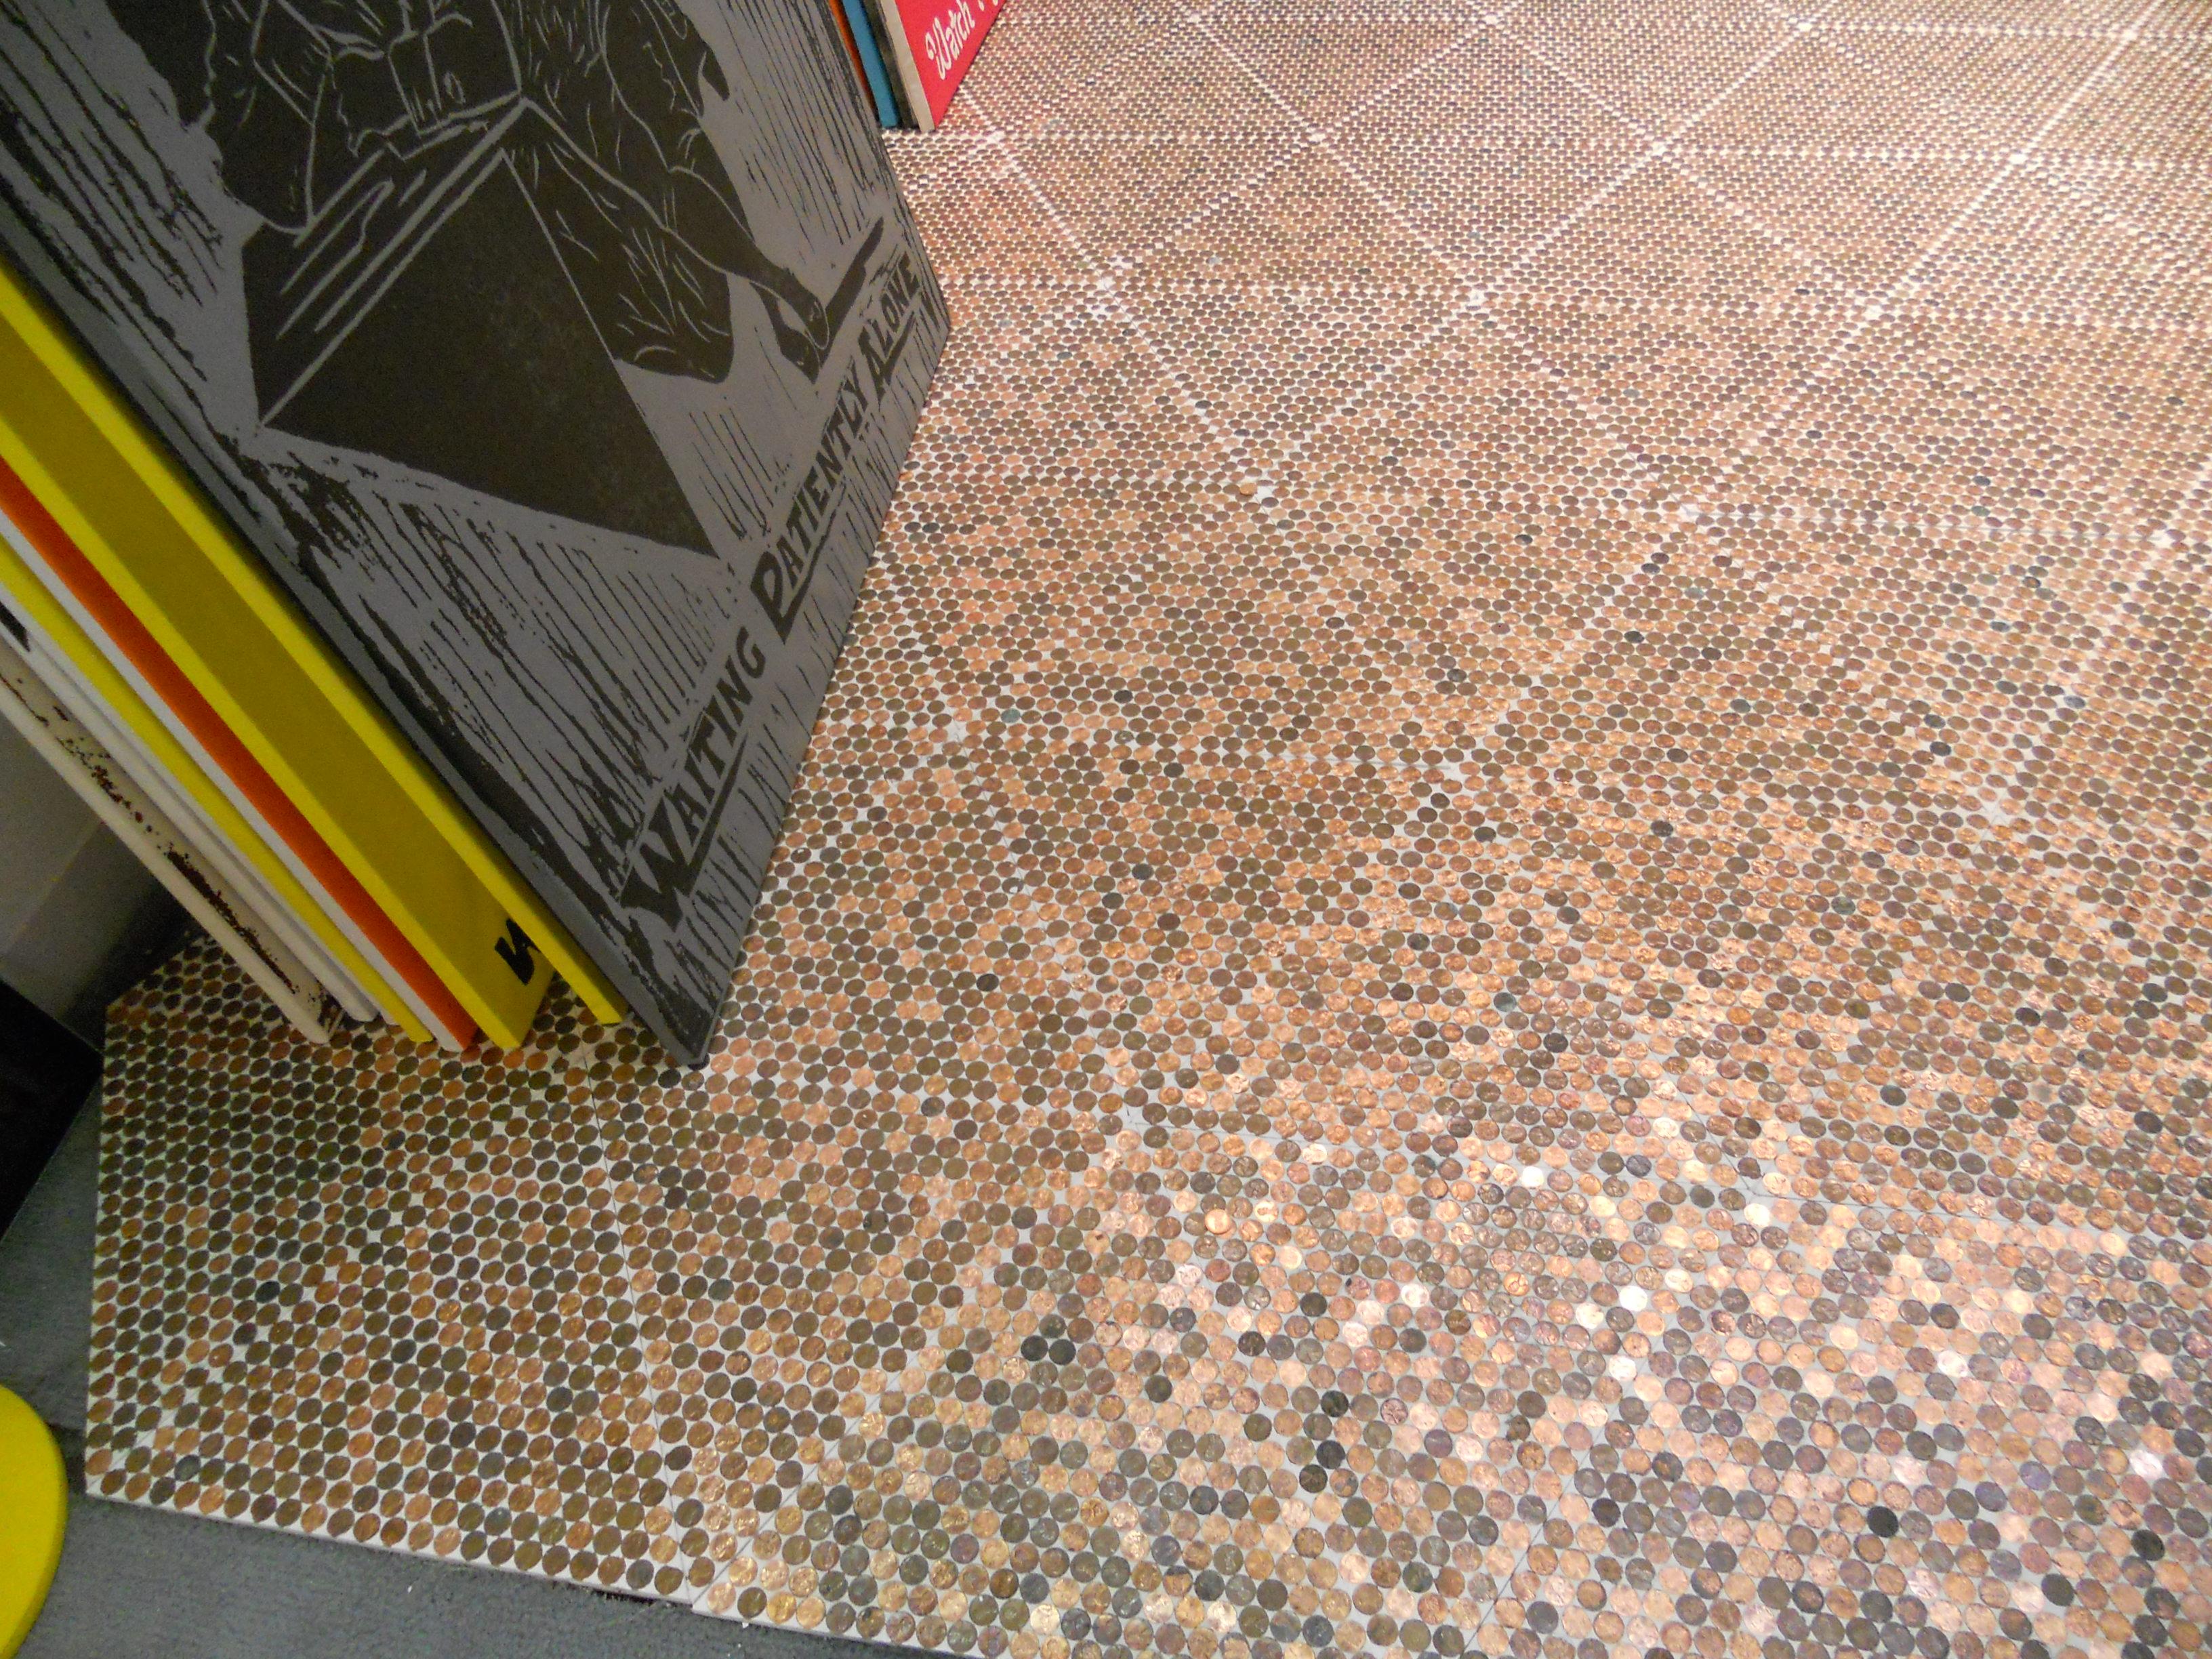 Penny Floor Templates